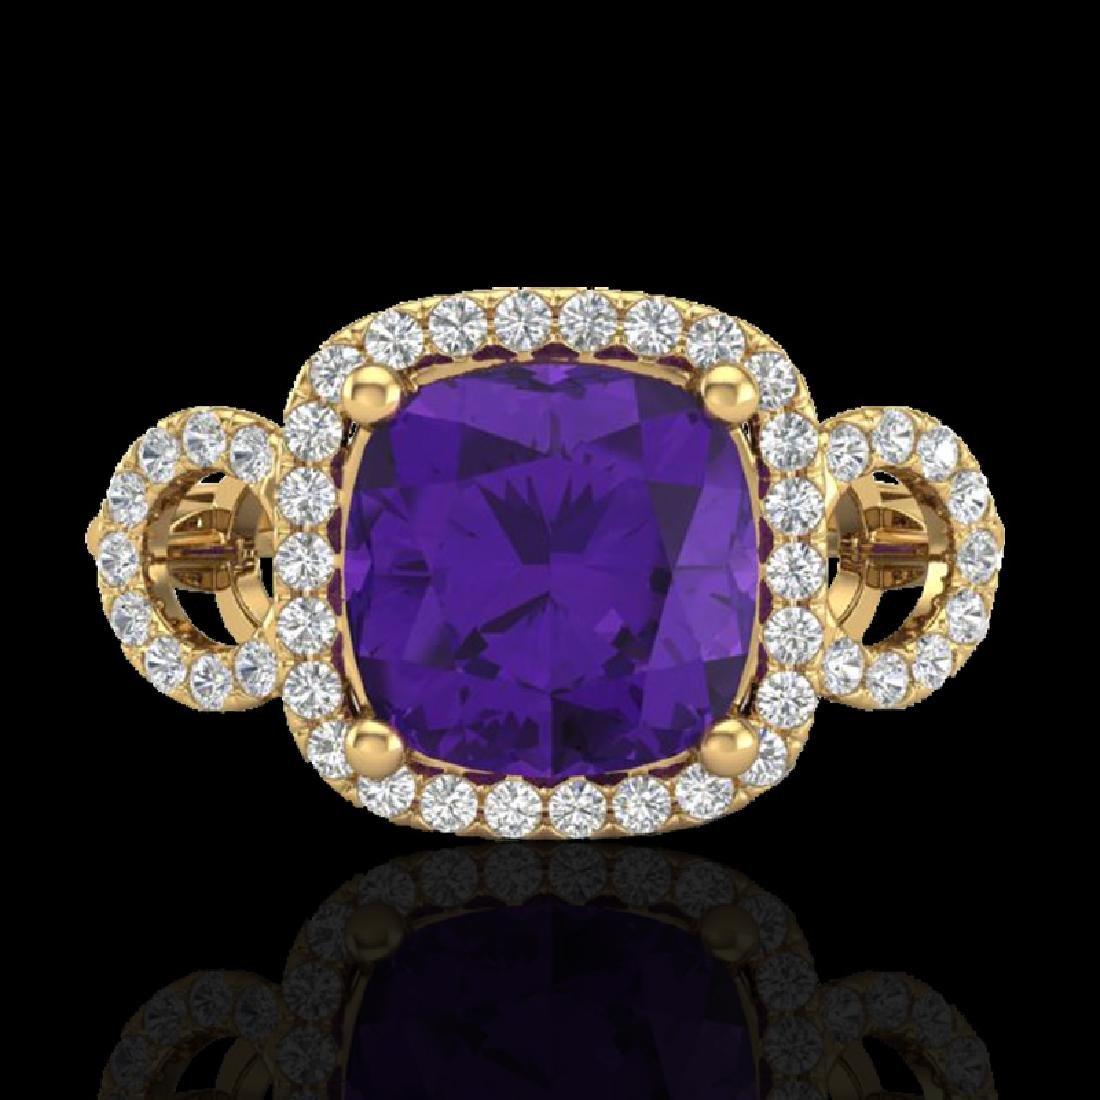 3.75 CTW Amethyst & Micro VS/SI Diamond Ring 18K Yellow